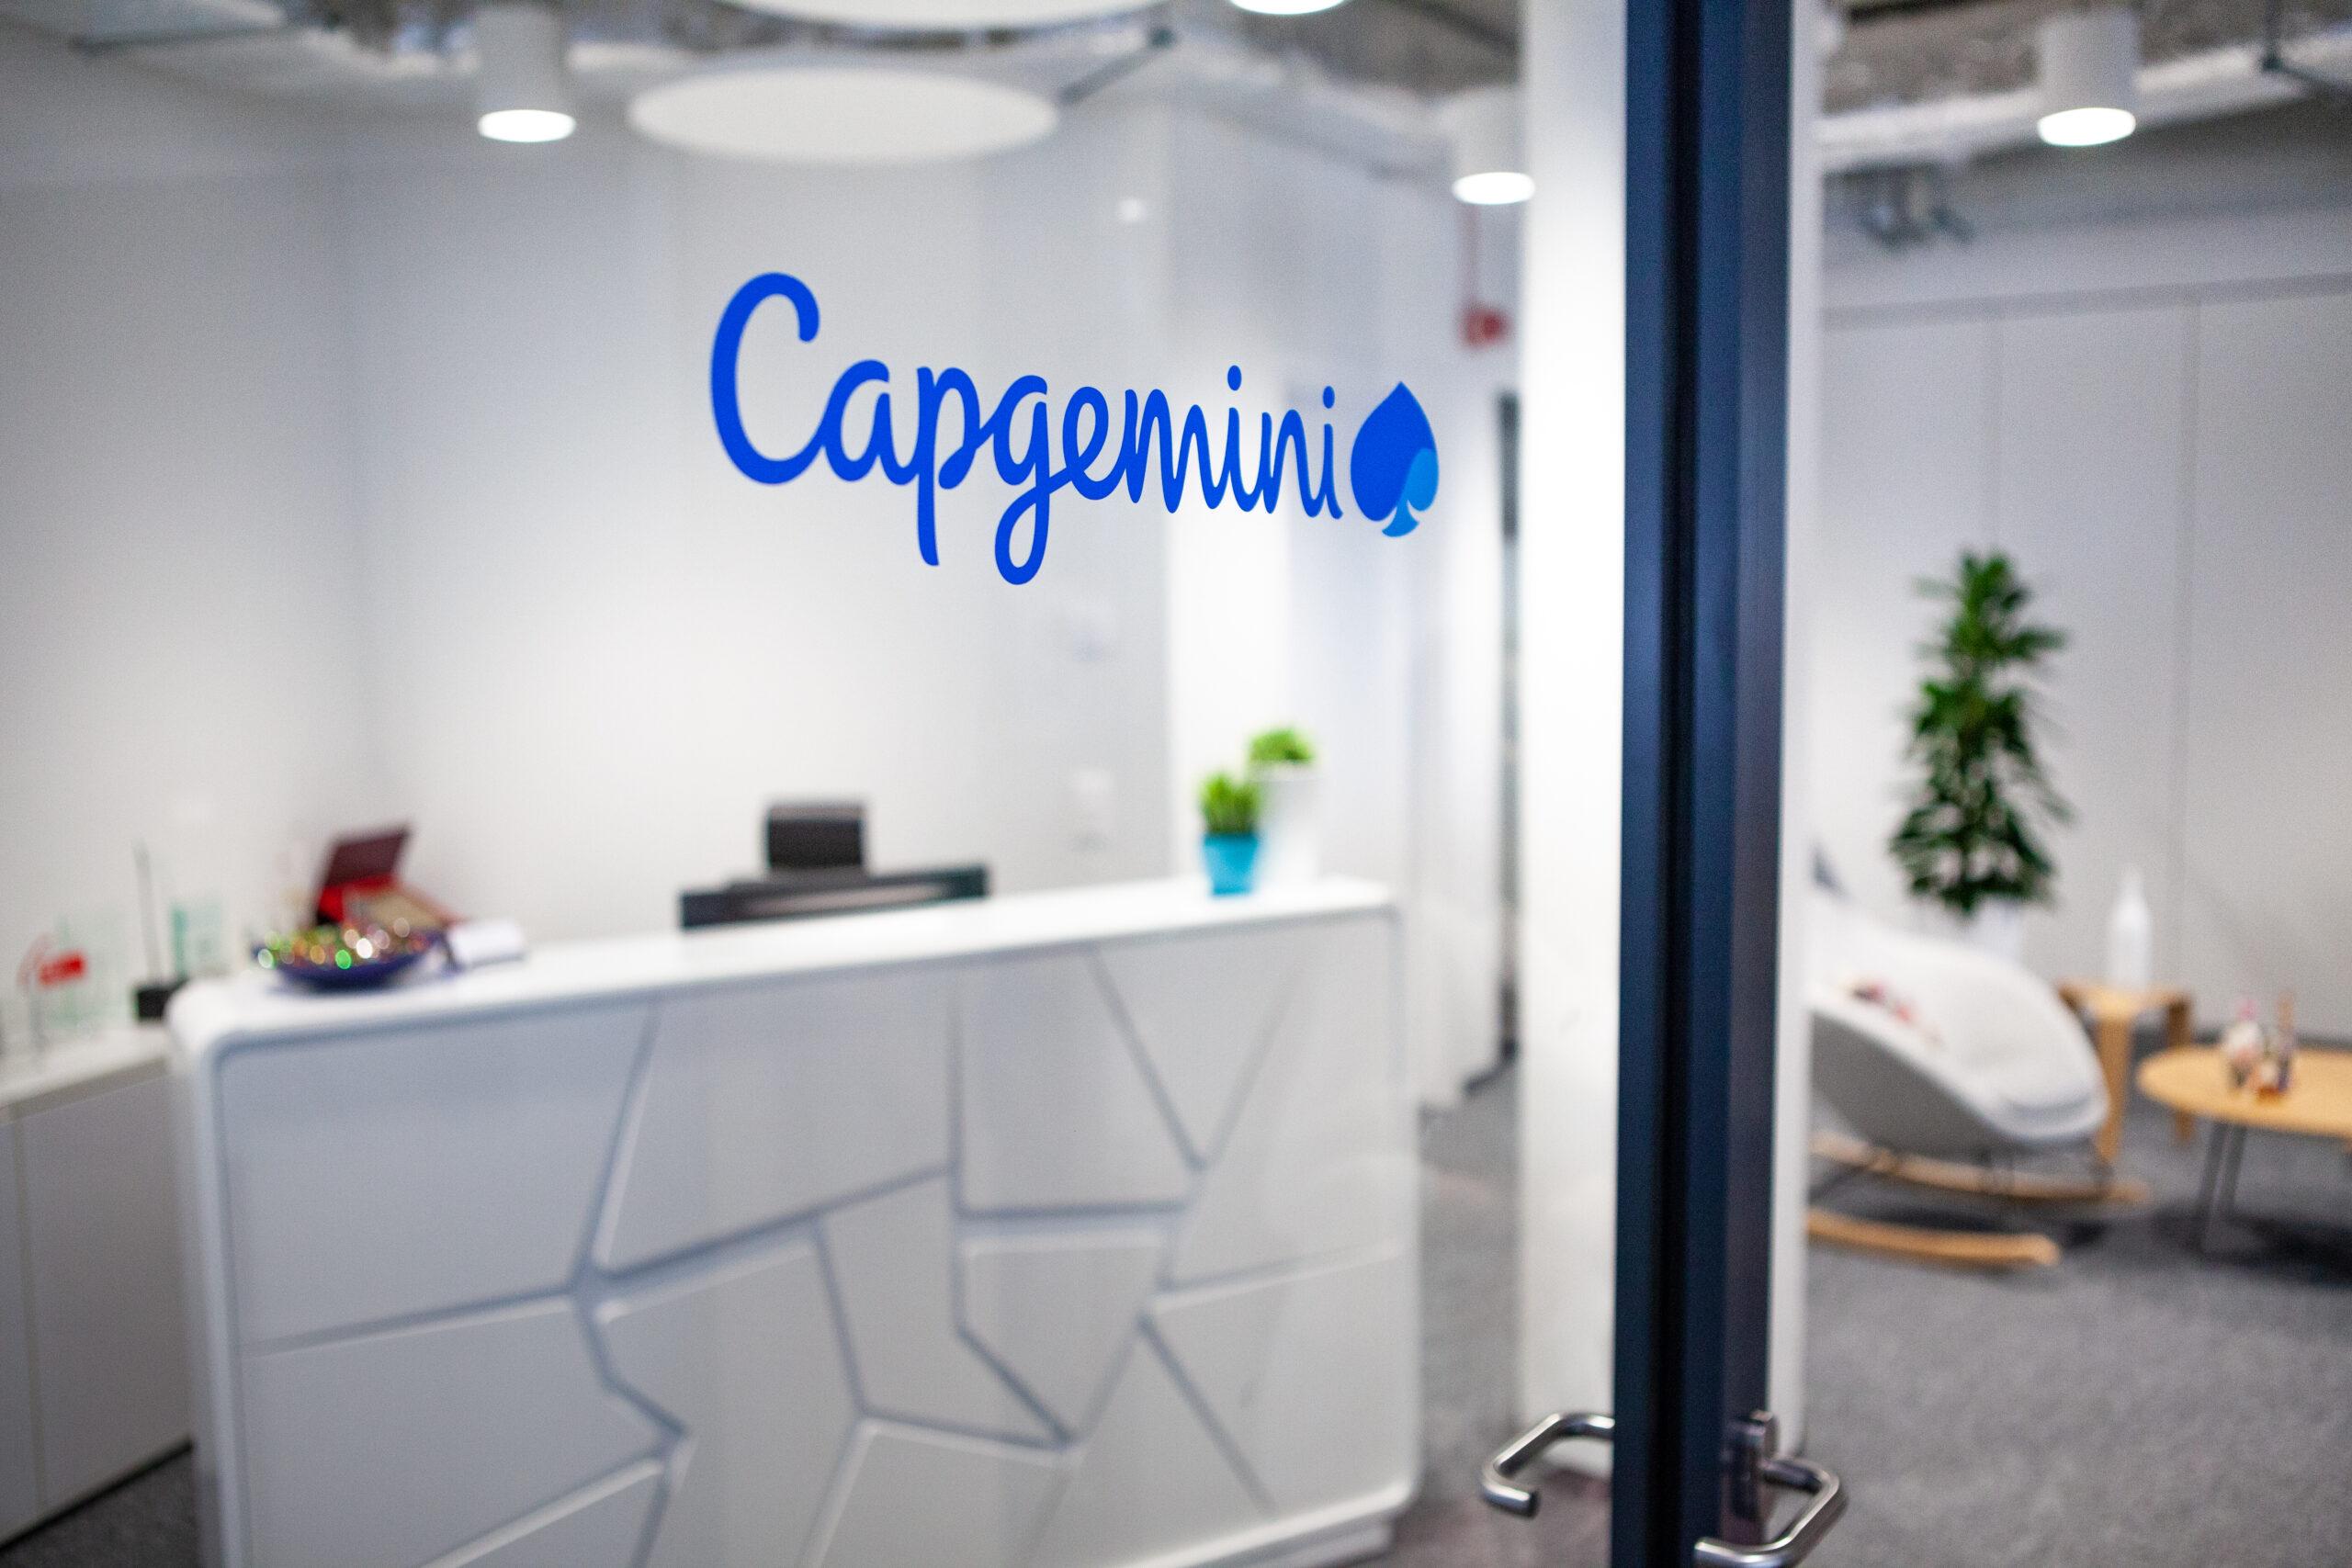 Realizacje - Capgemini Software Solutions Center